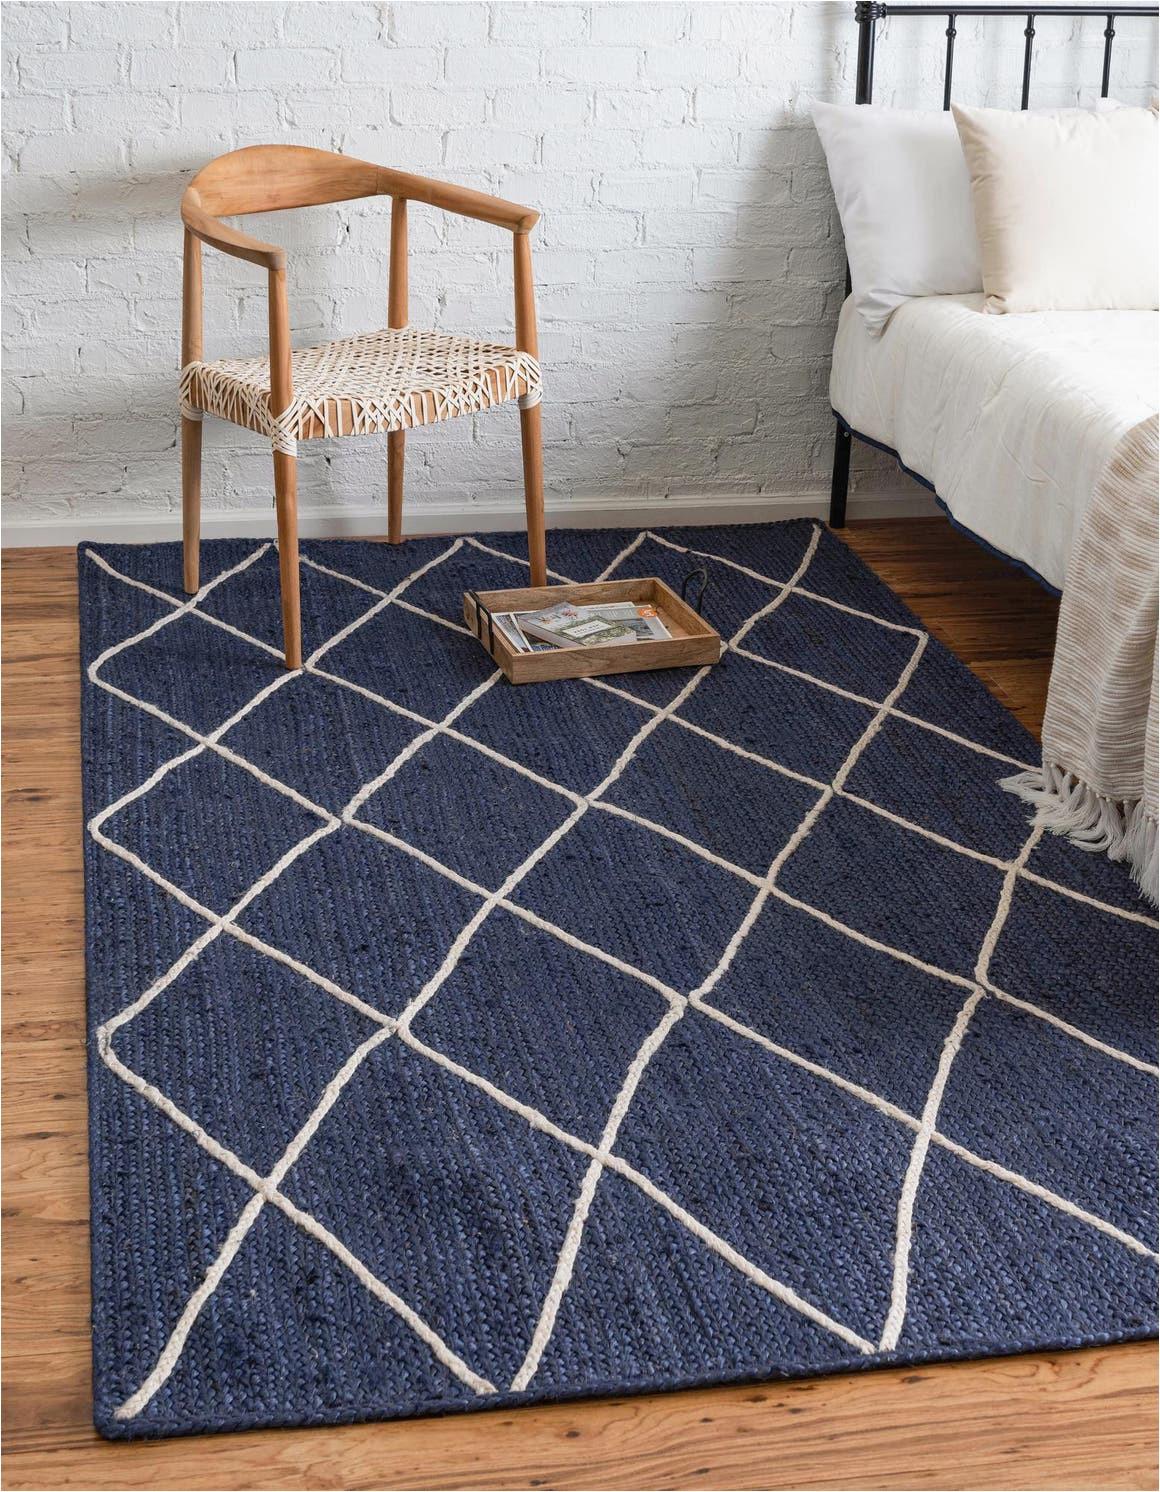 navy blue 4x6 braided jute area rug